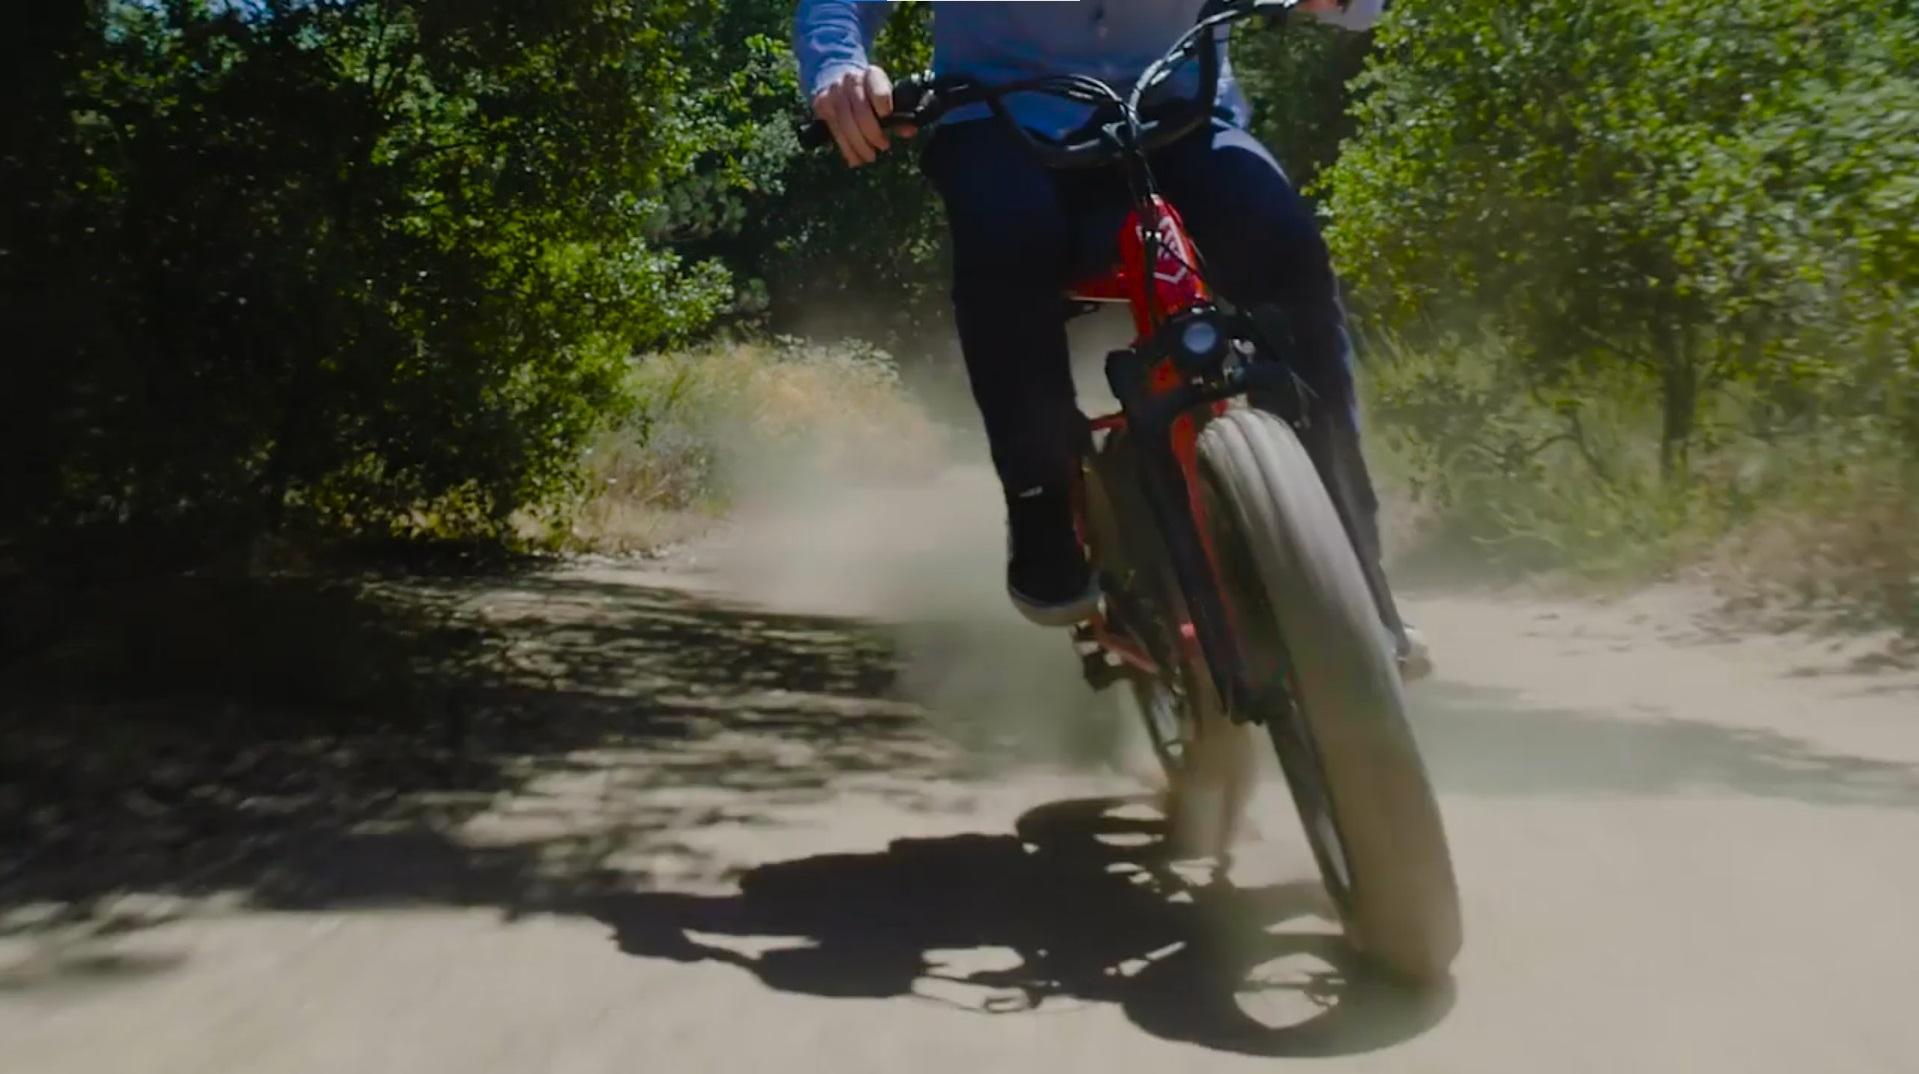 Juiced Bikes Scrambler fast and powerful e-bike